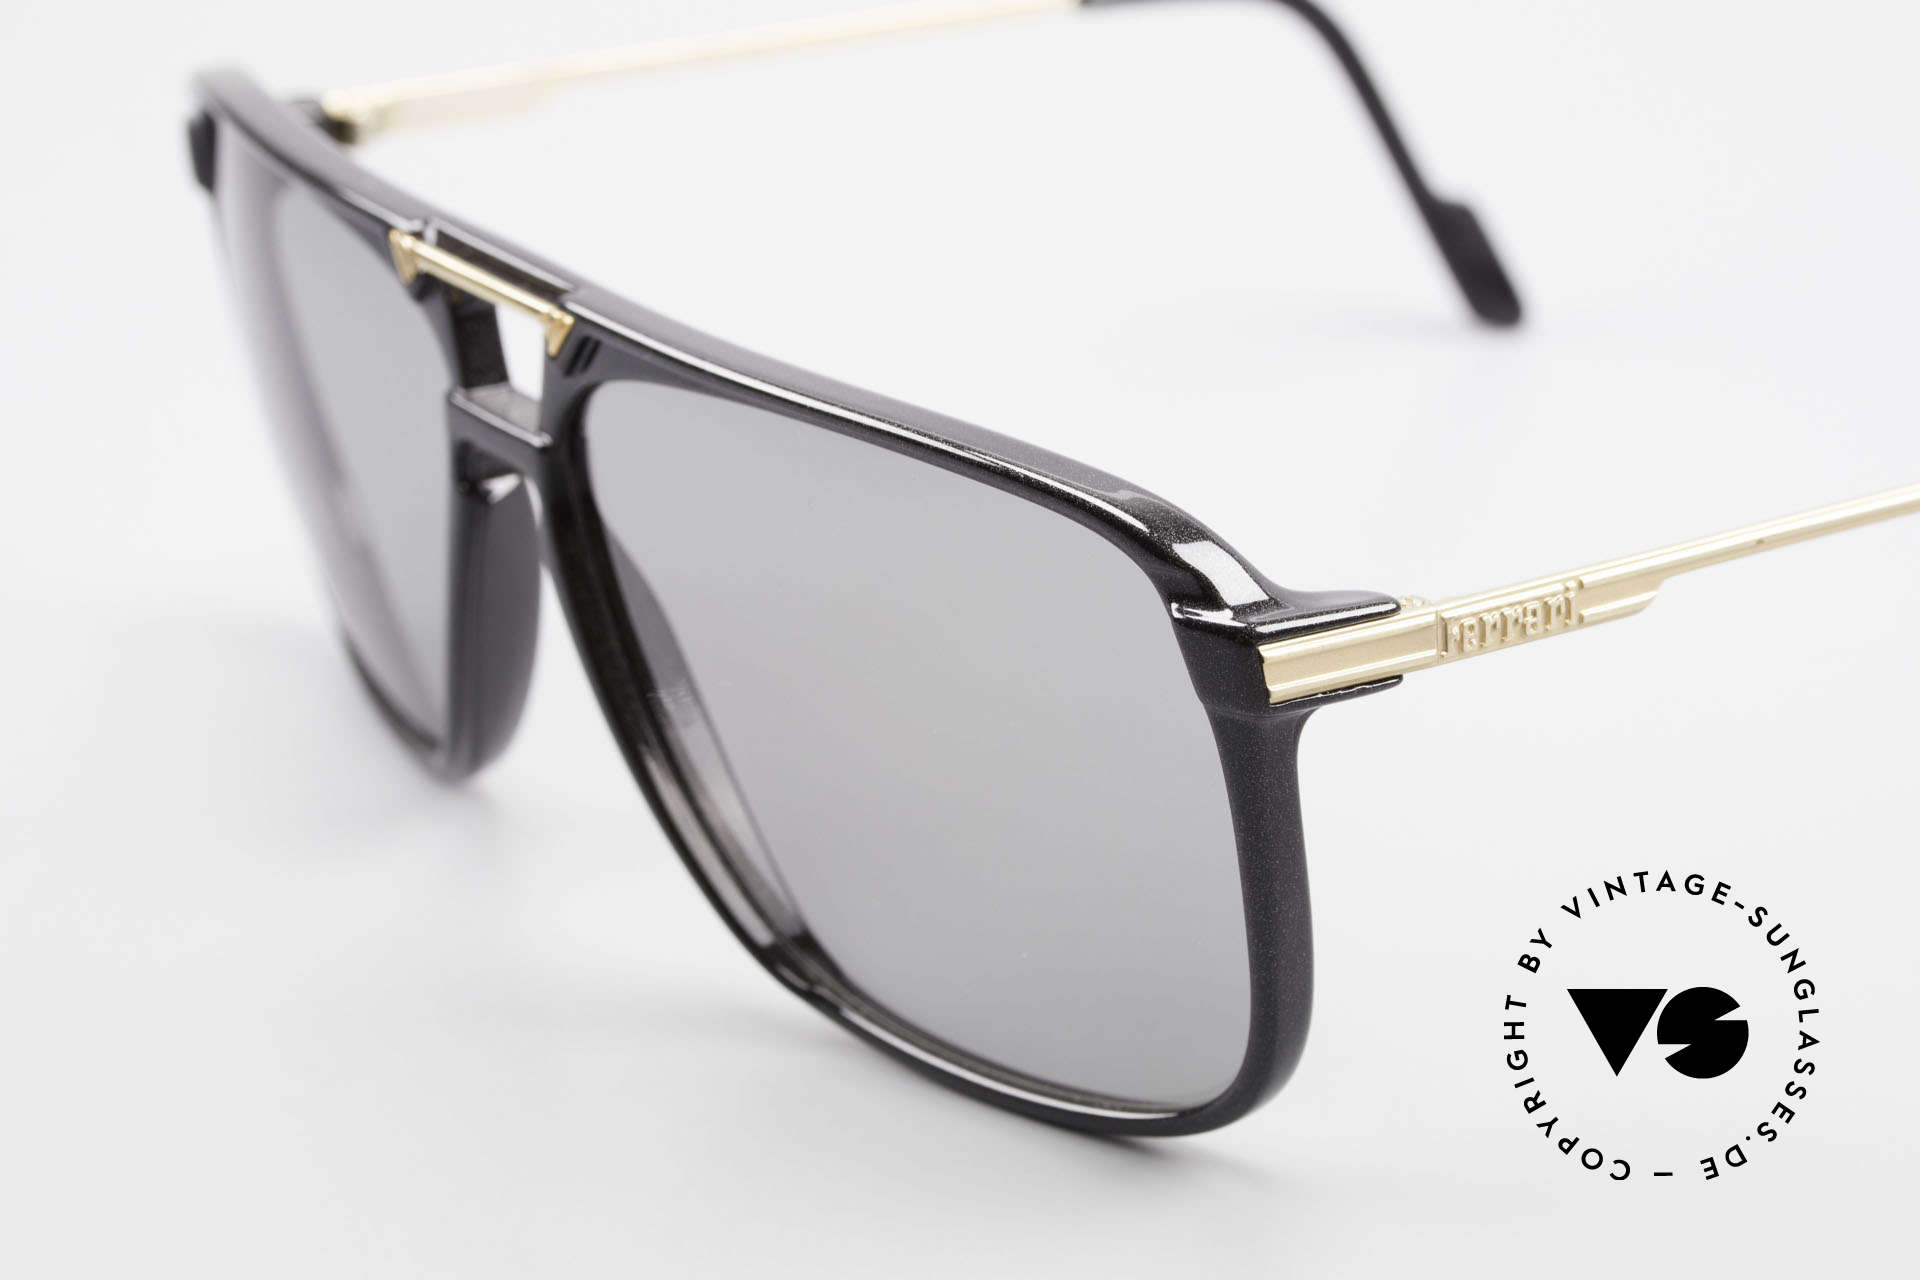 Ferrari F36/S Men's Carbon Sunglasses 90's, rare vintage shades of the FERRARI FORMULA series, Made for Men